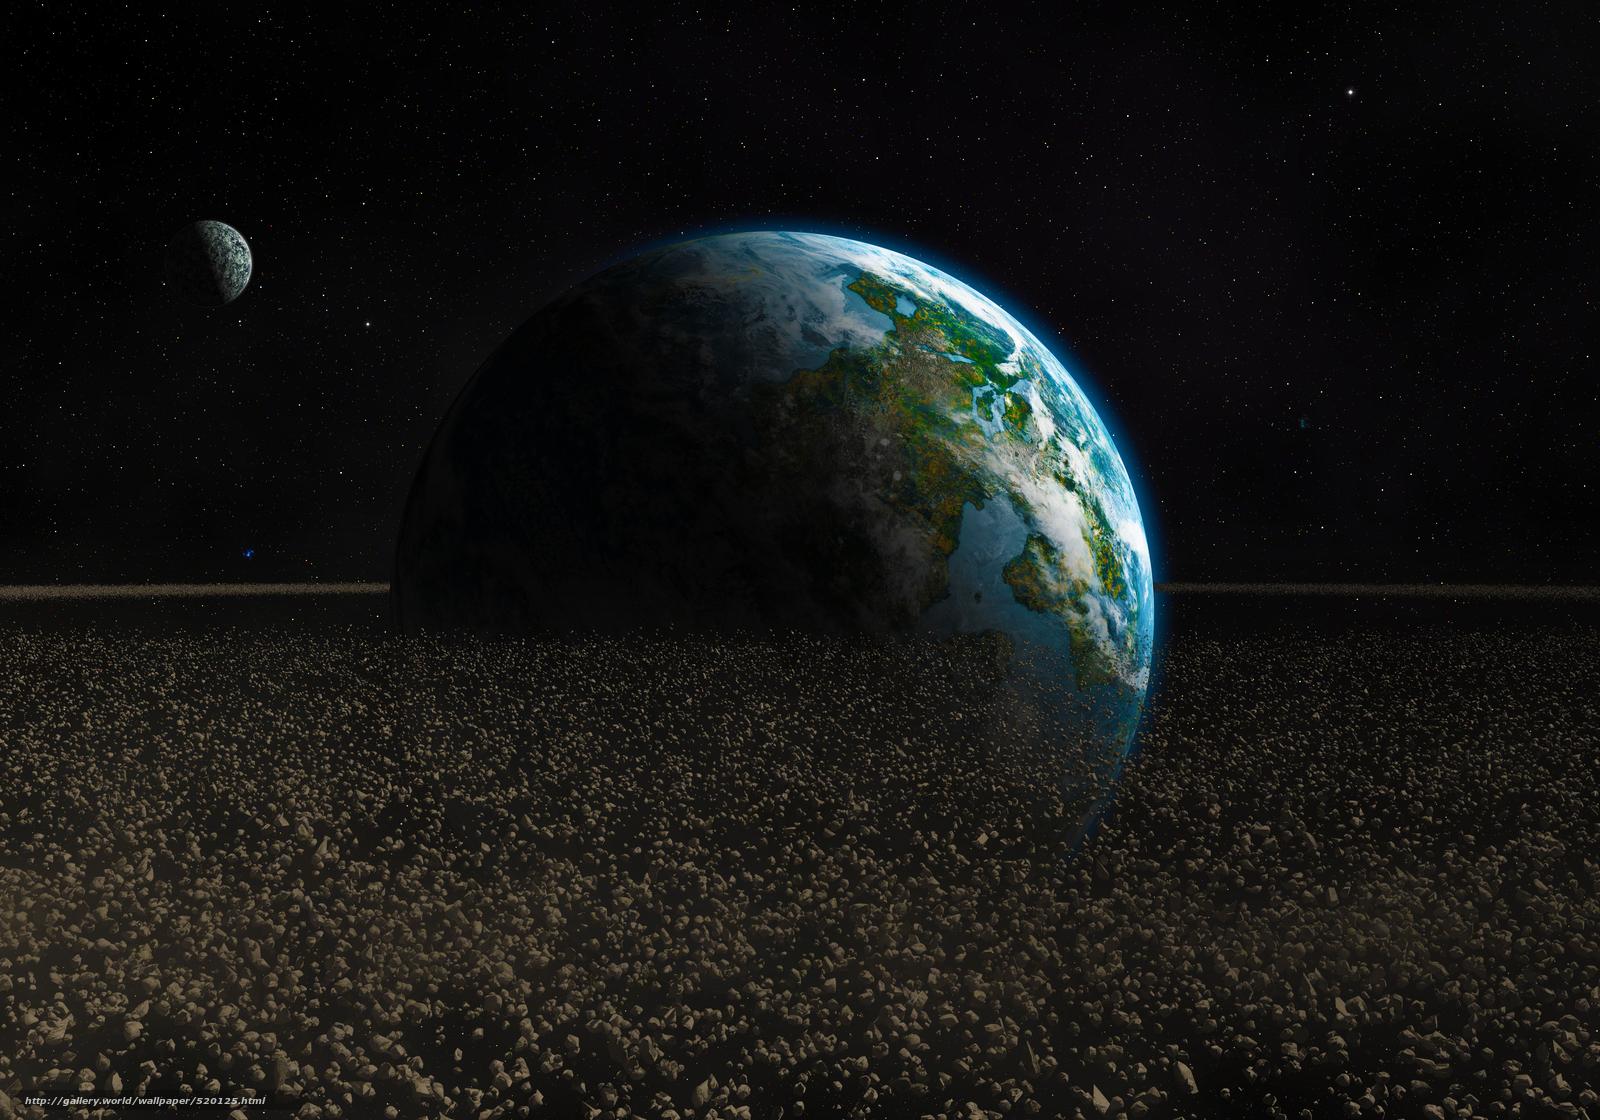 Скачать на телефон обои фото картинку на тему арт, астероиды, планета, обломки, камни, Земля, космос, разширение 5000x3500